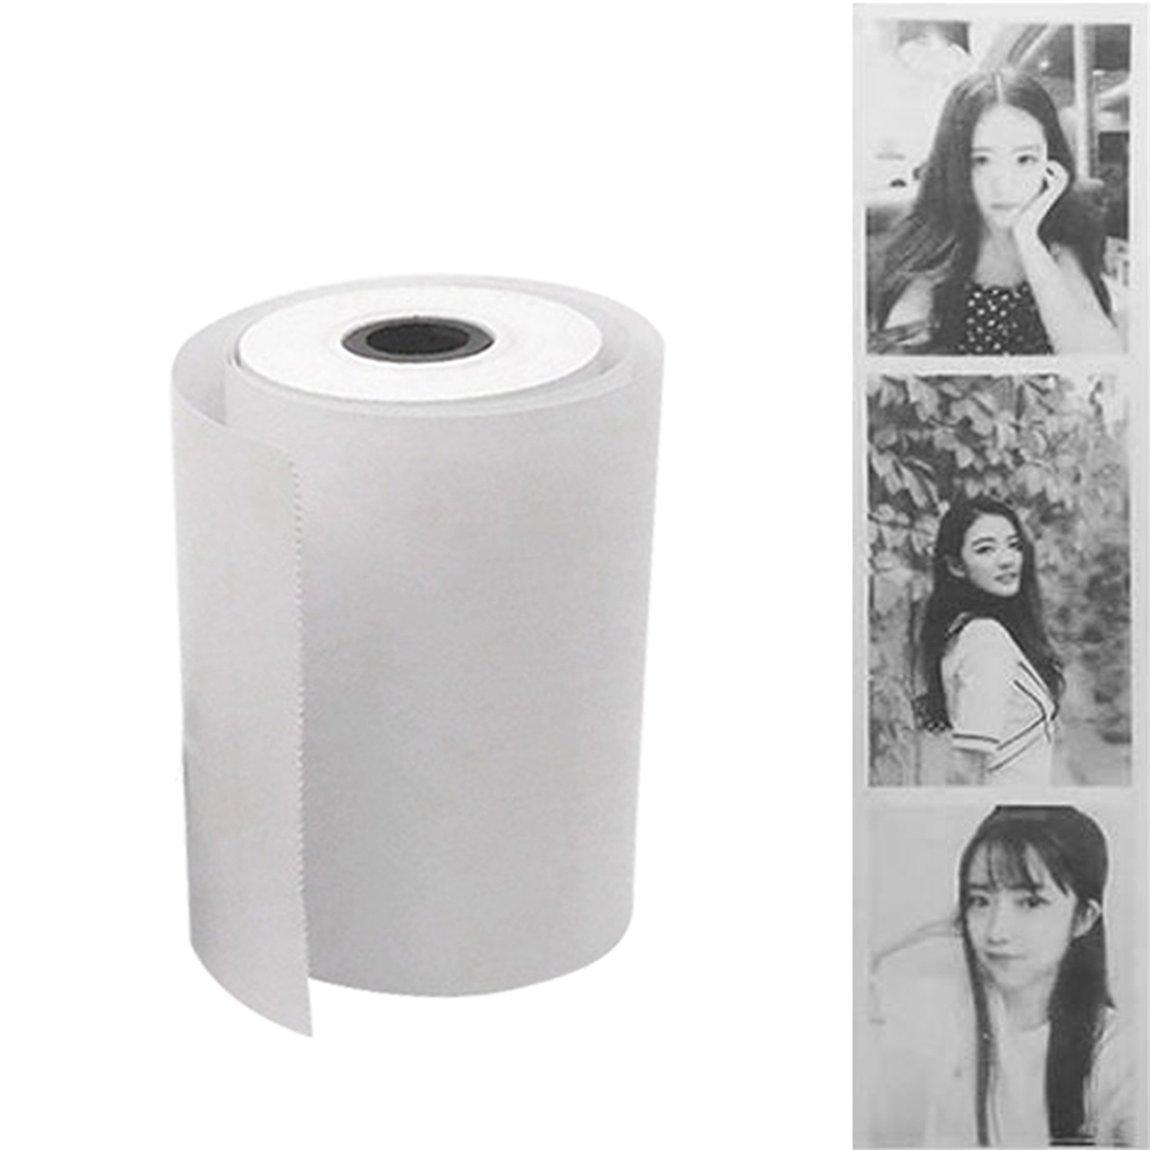 1 Roll Coreless Heat-Sensitive Paper Canvas Mobile POS